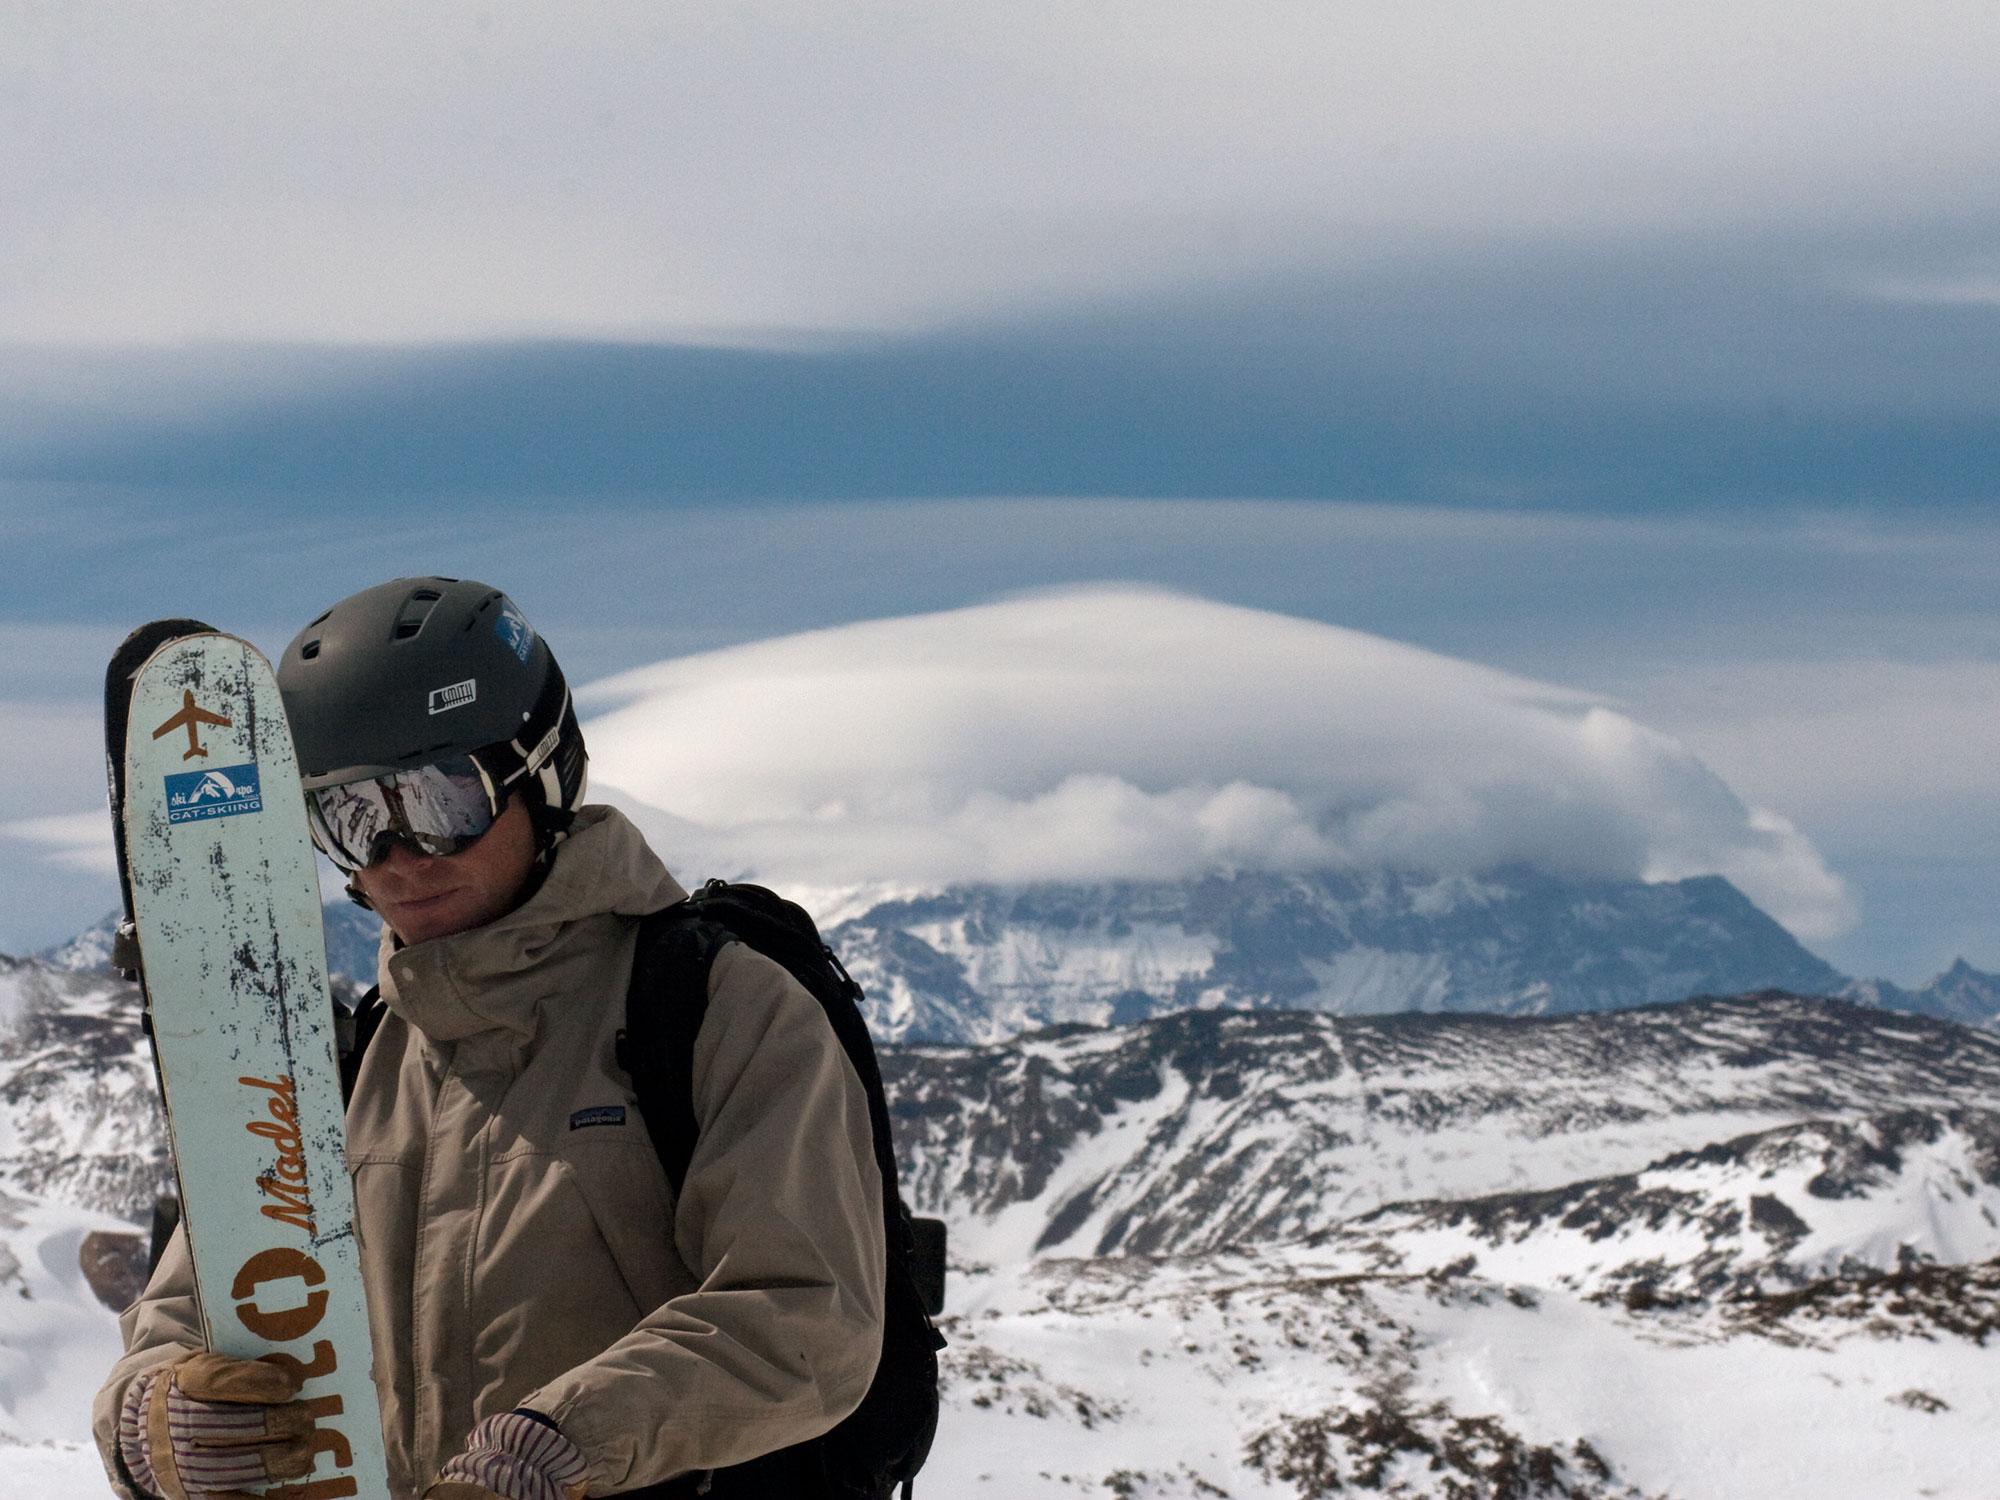 Mount Acongagua